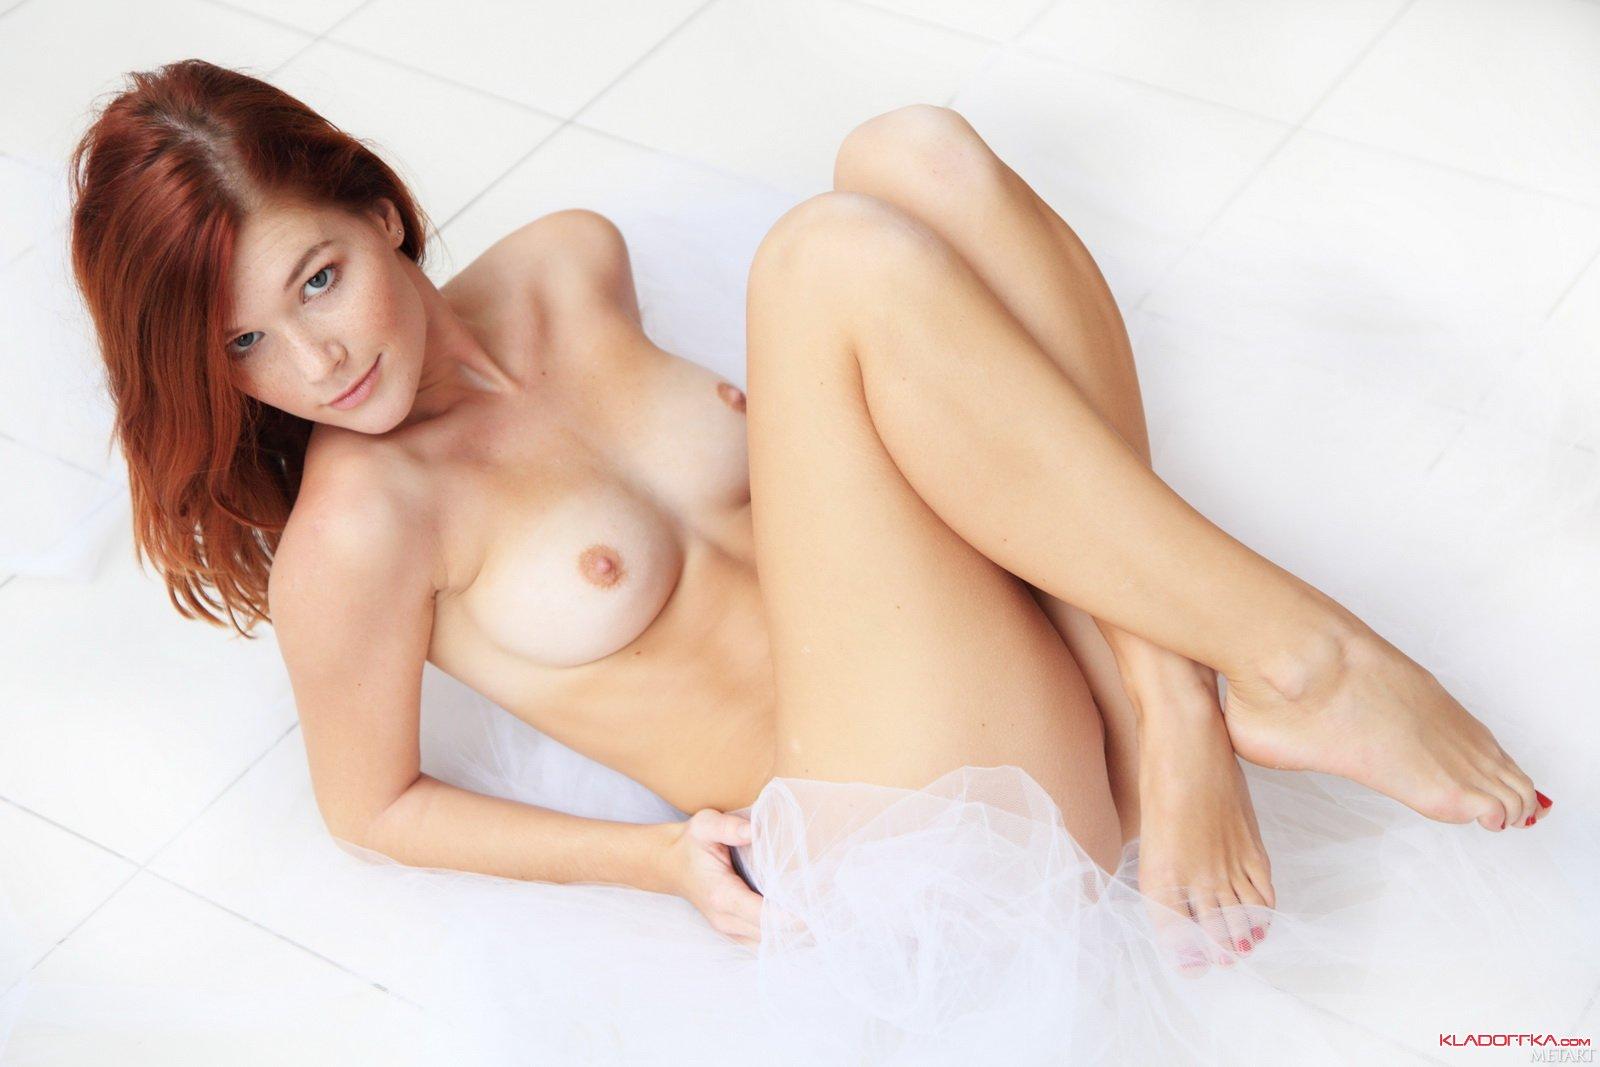 фото секса на открытом воздухе